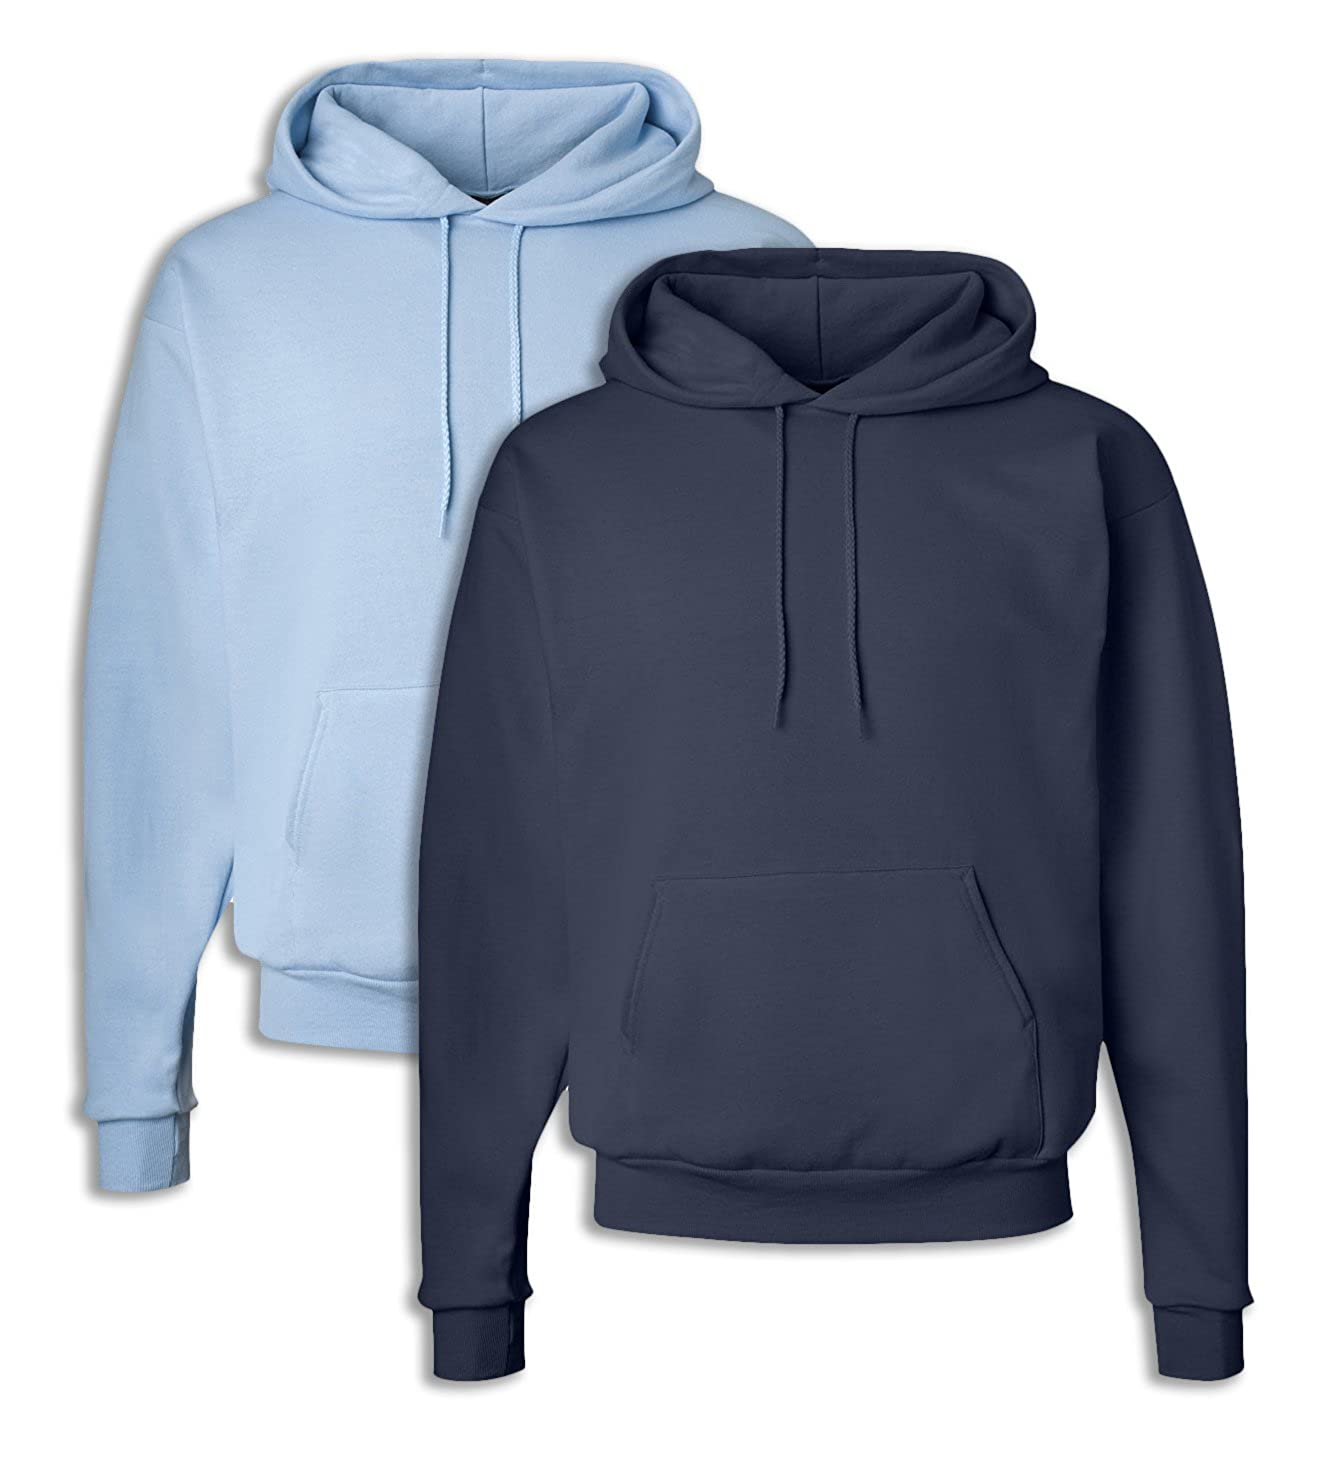 1 Navy Hanes P170 Mens EcoSmart Hooded Sweatshirt 2XL 1 Light Blue